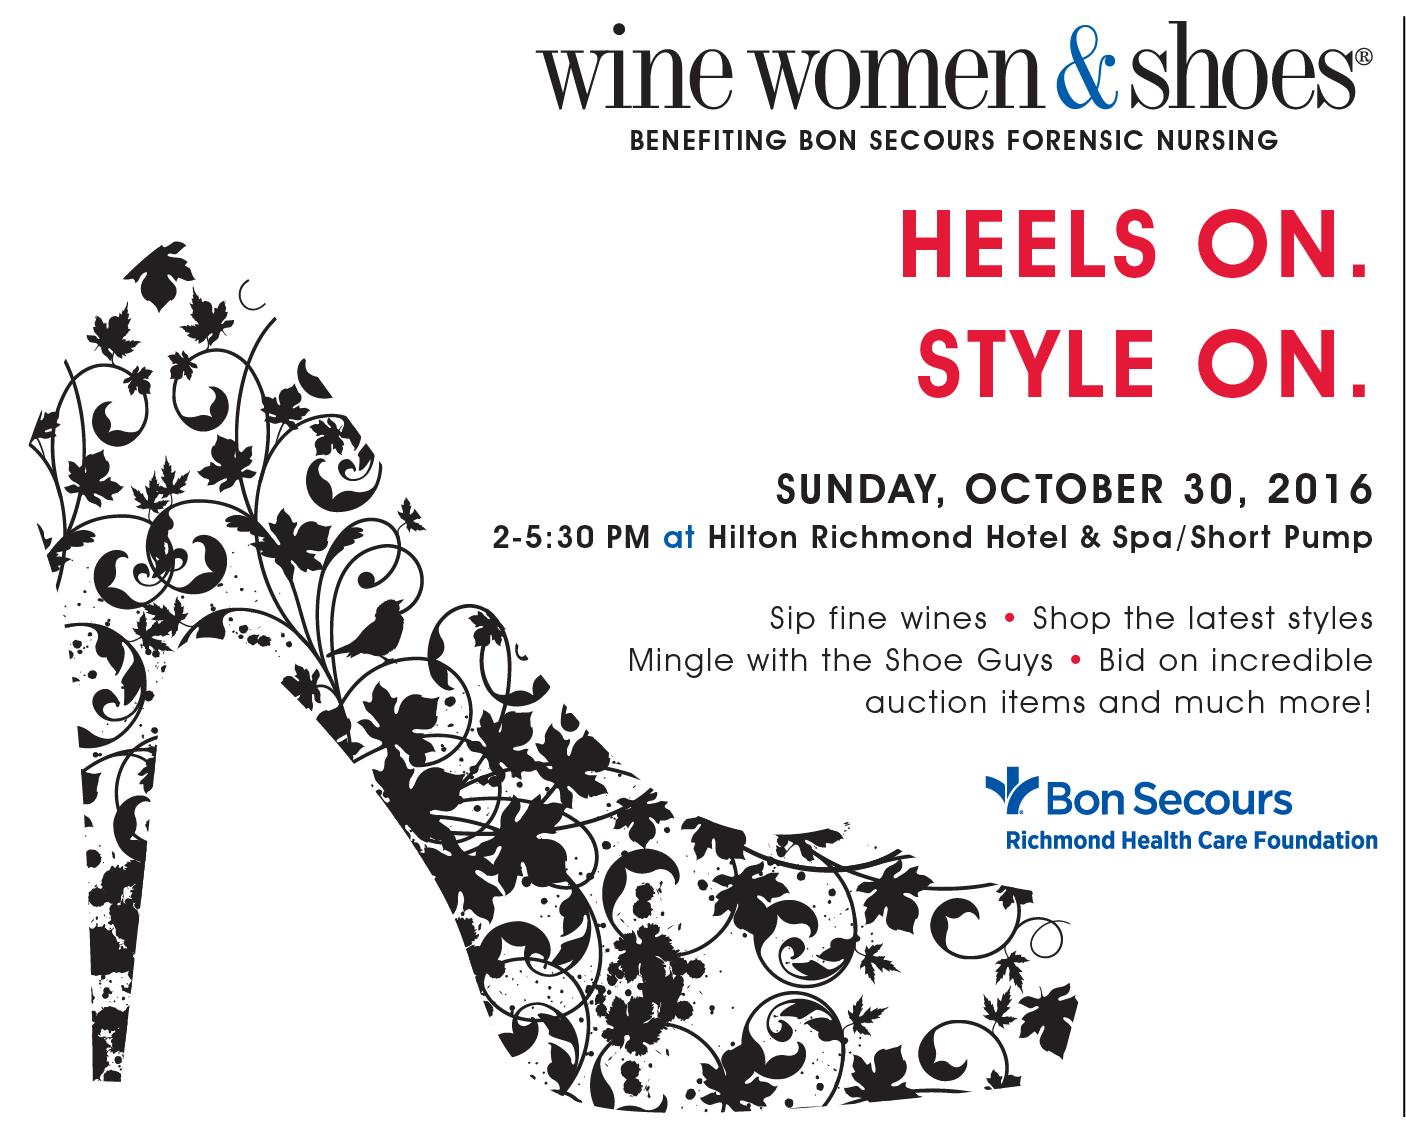 Chic-Stripes-Wine-Women-Shoes-Richmond-2016.png